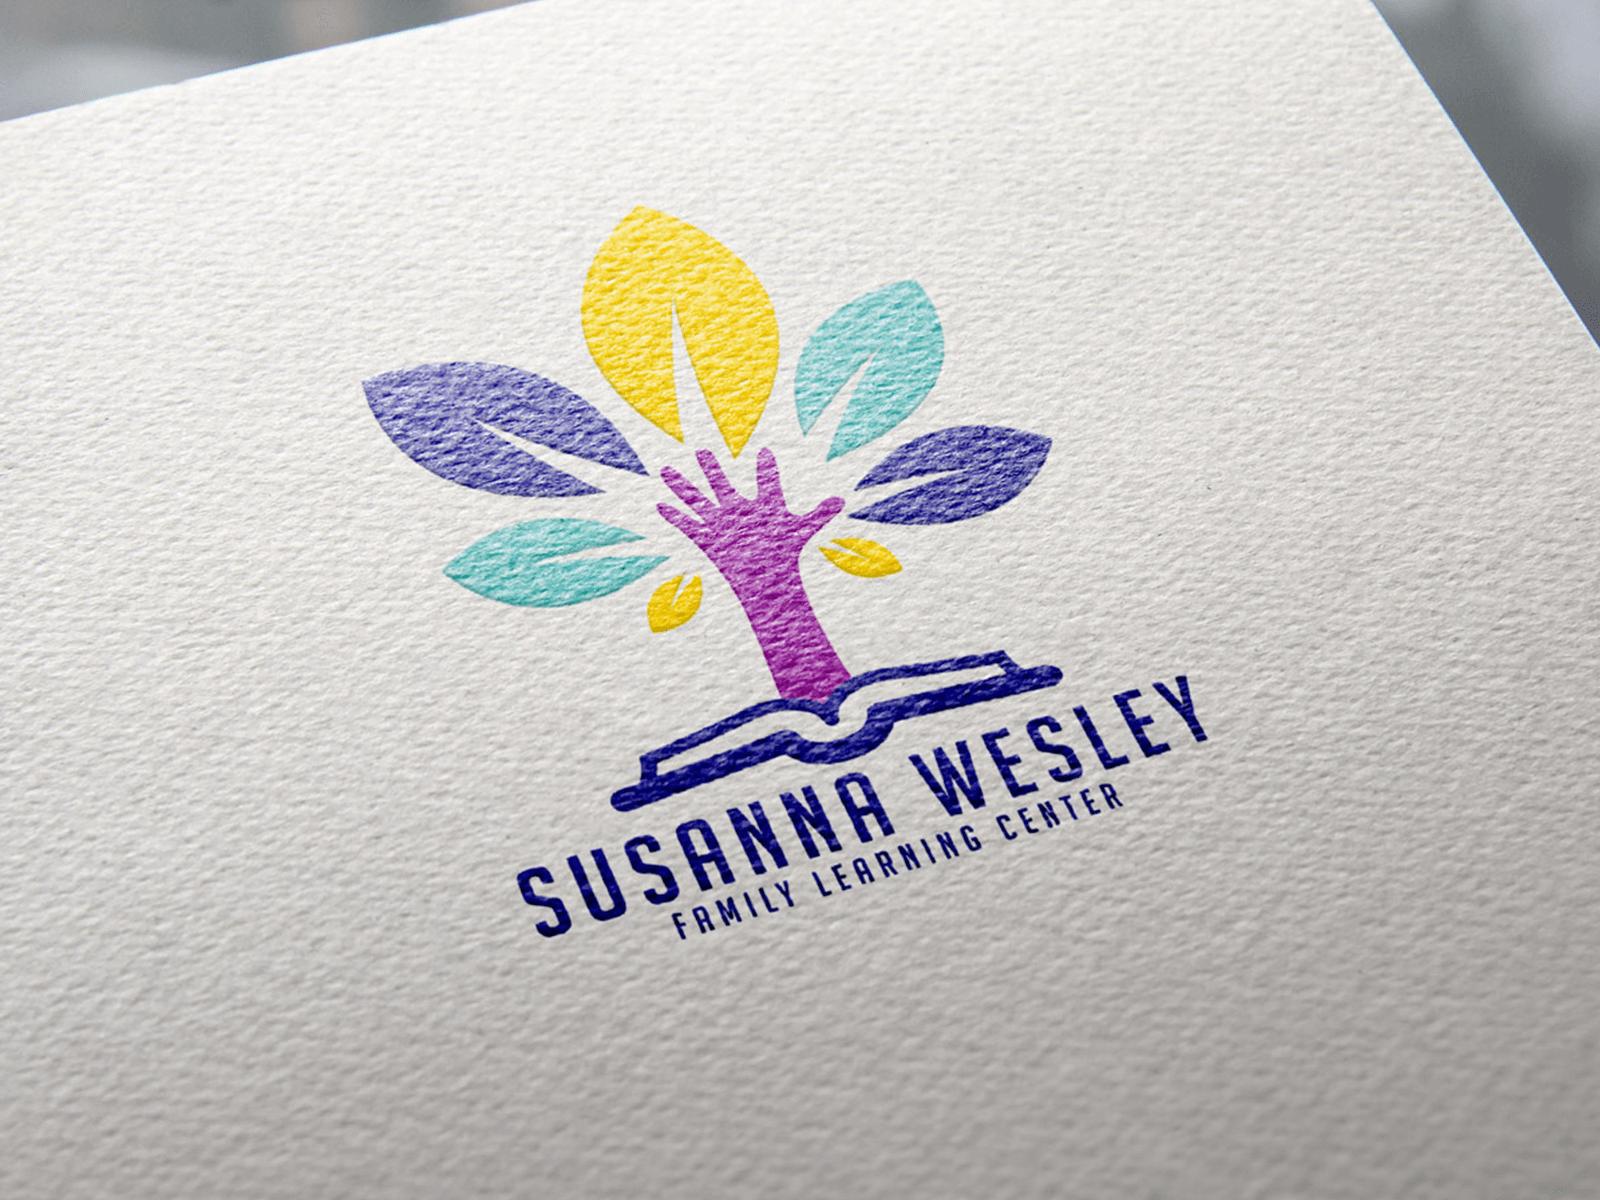 susanna-wesley-logo.png